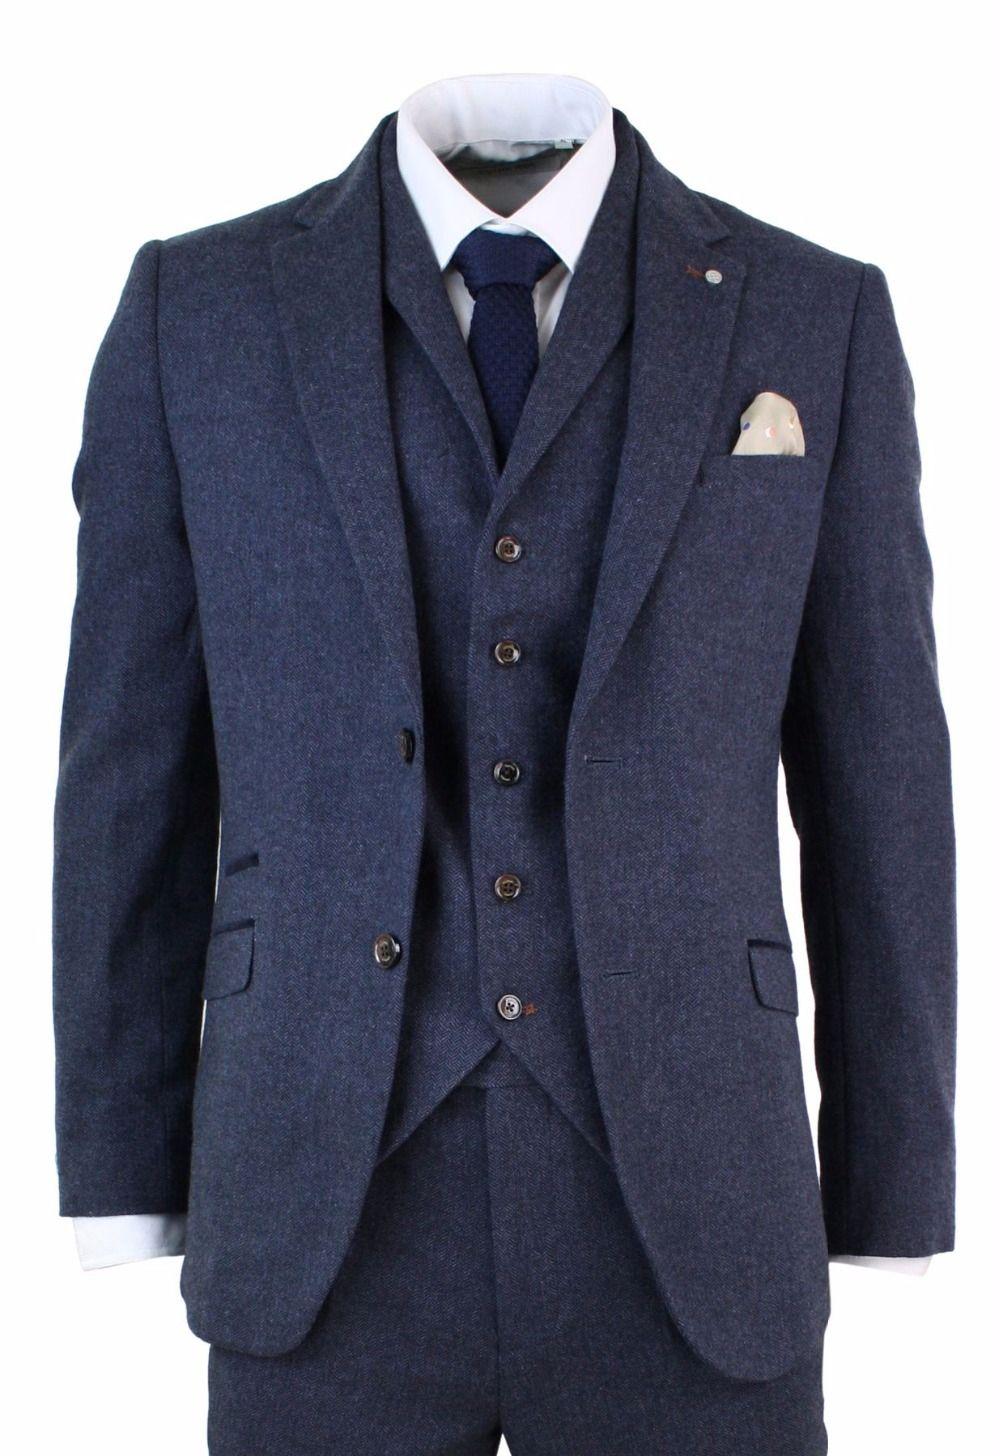 2018 Latest Coat Pant Designs Navy Blue Tweed Men Suit Jacket Prom Tuxedo  Slim Fit Groom 402490ffa87d